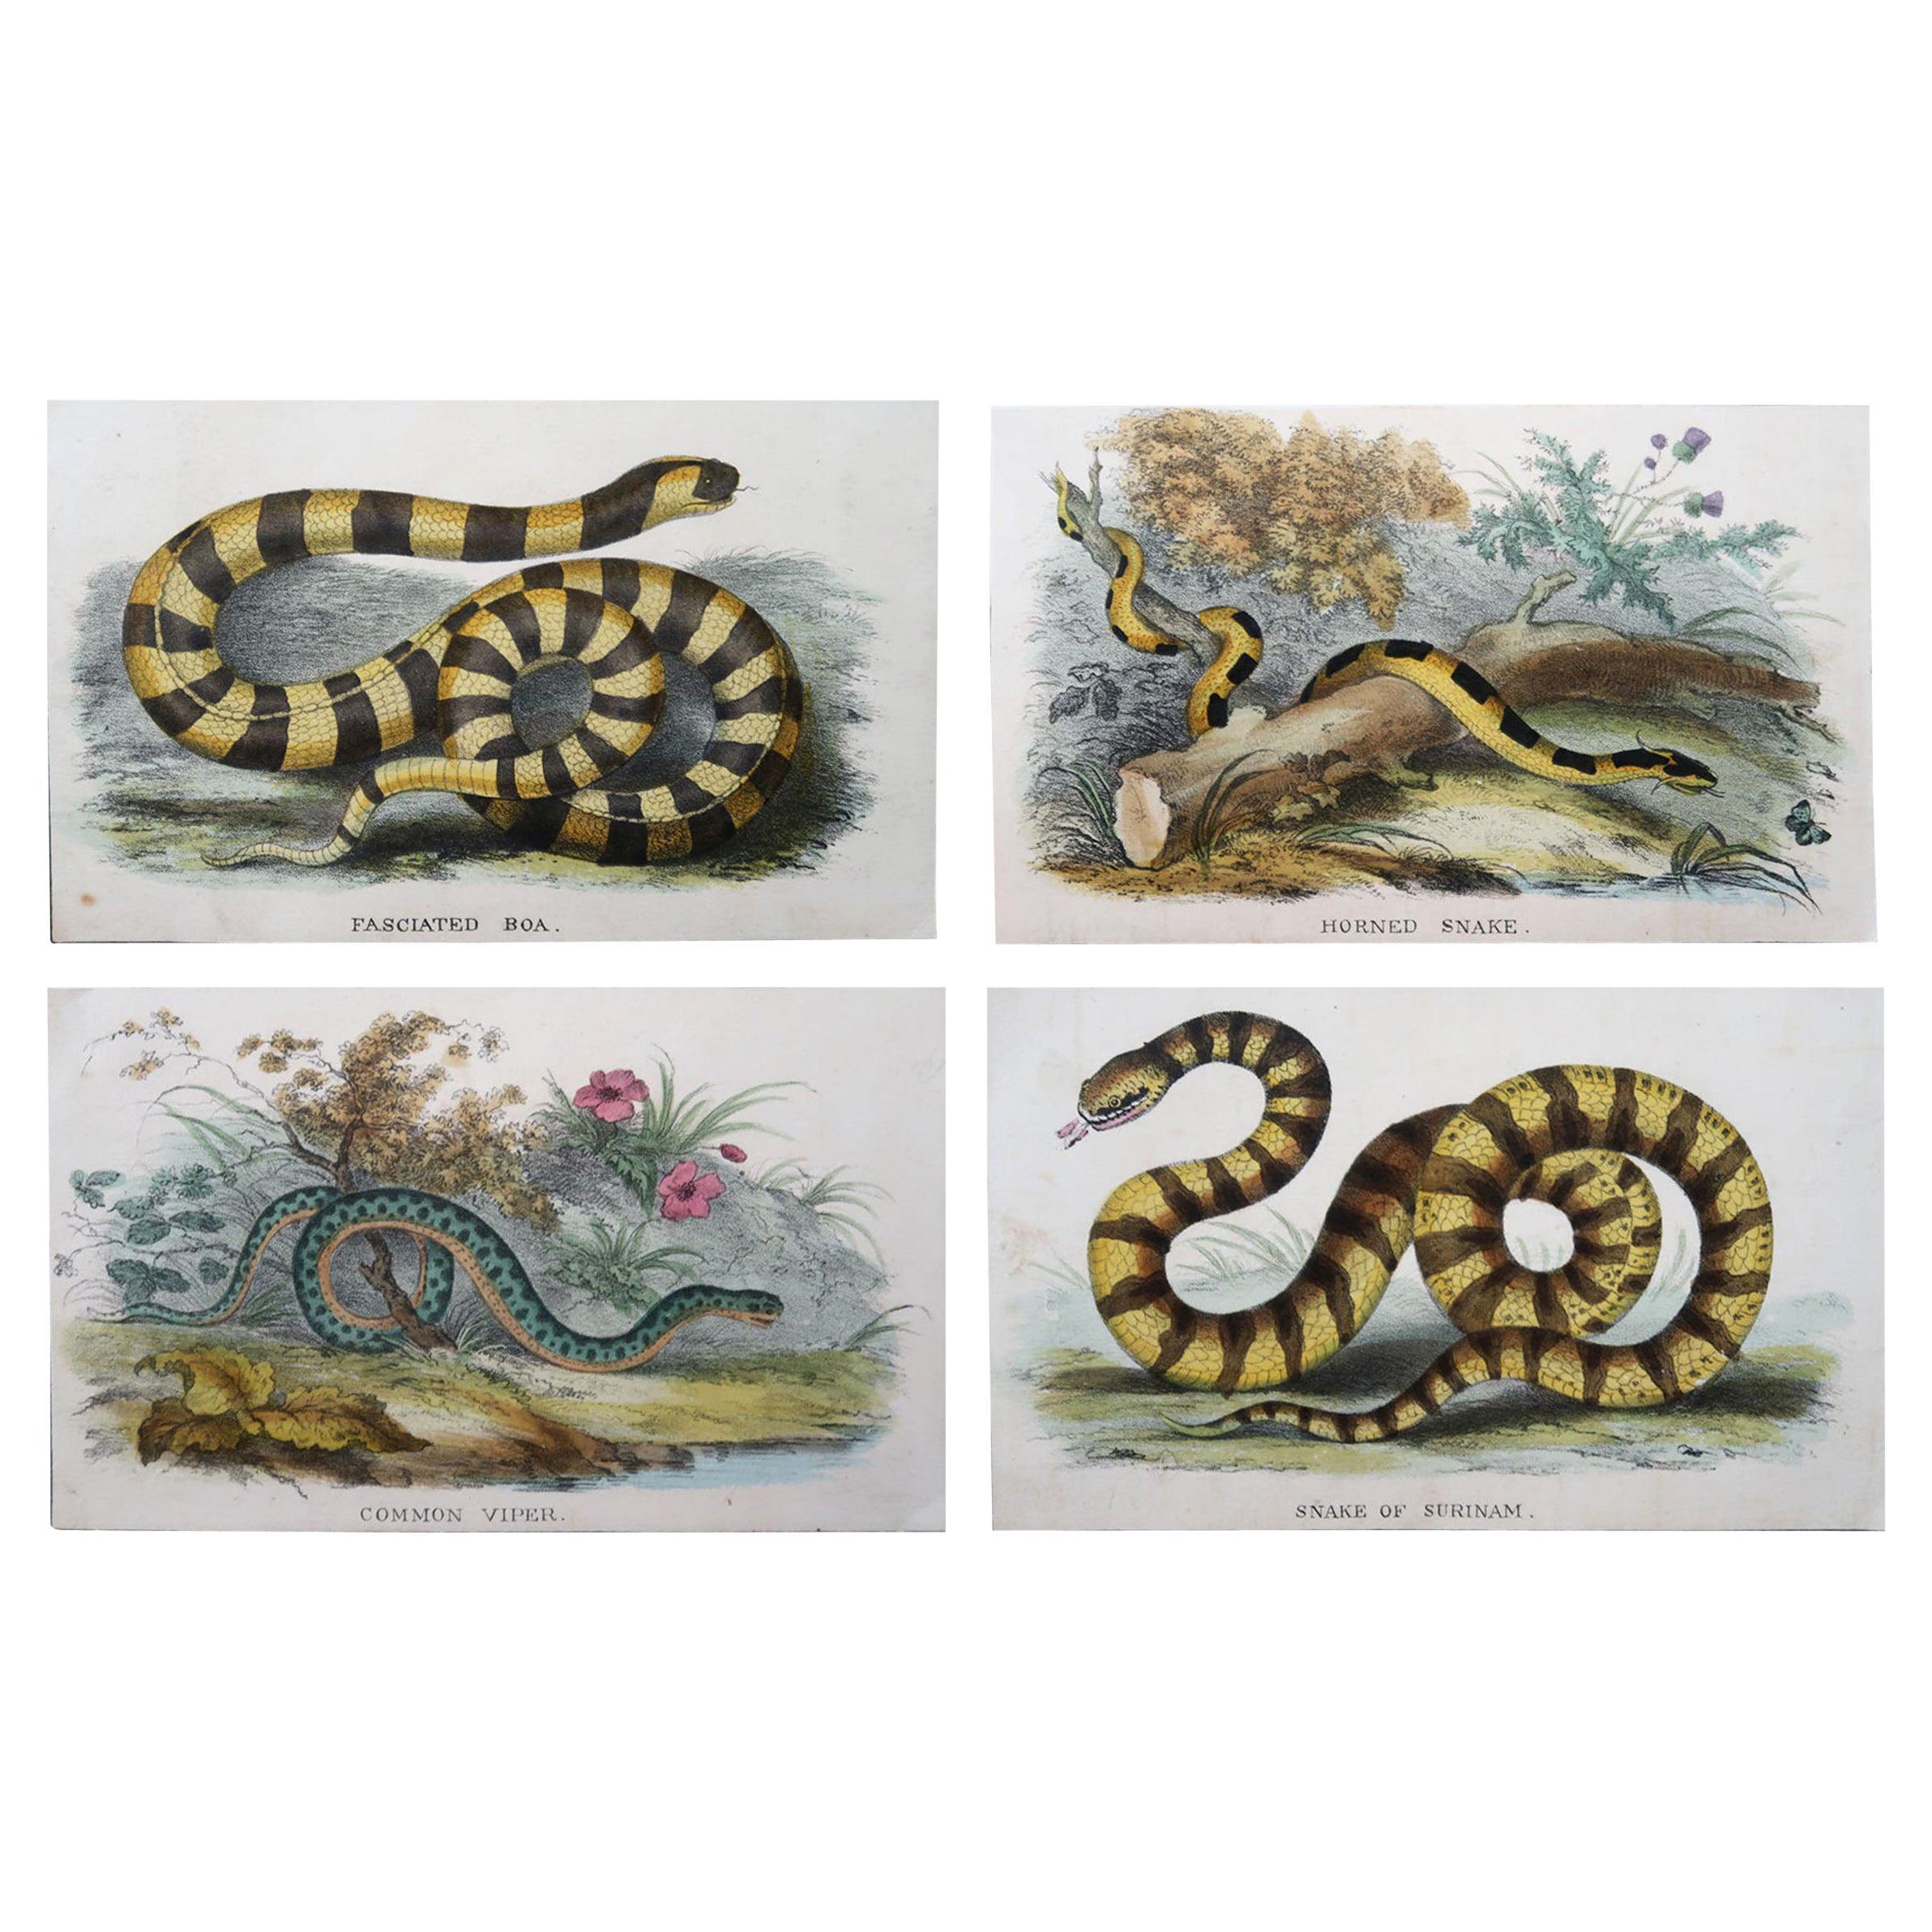 Set of 4 Original Antique Prints of Snakes, circa 1860